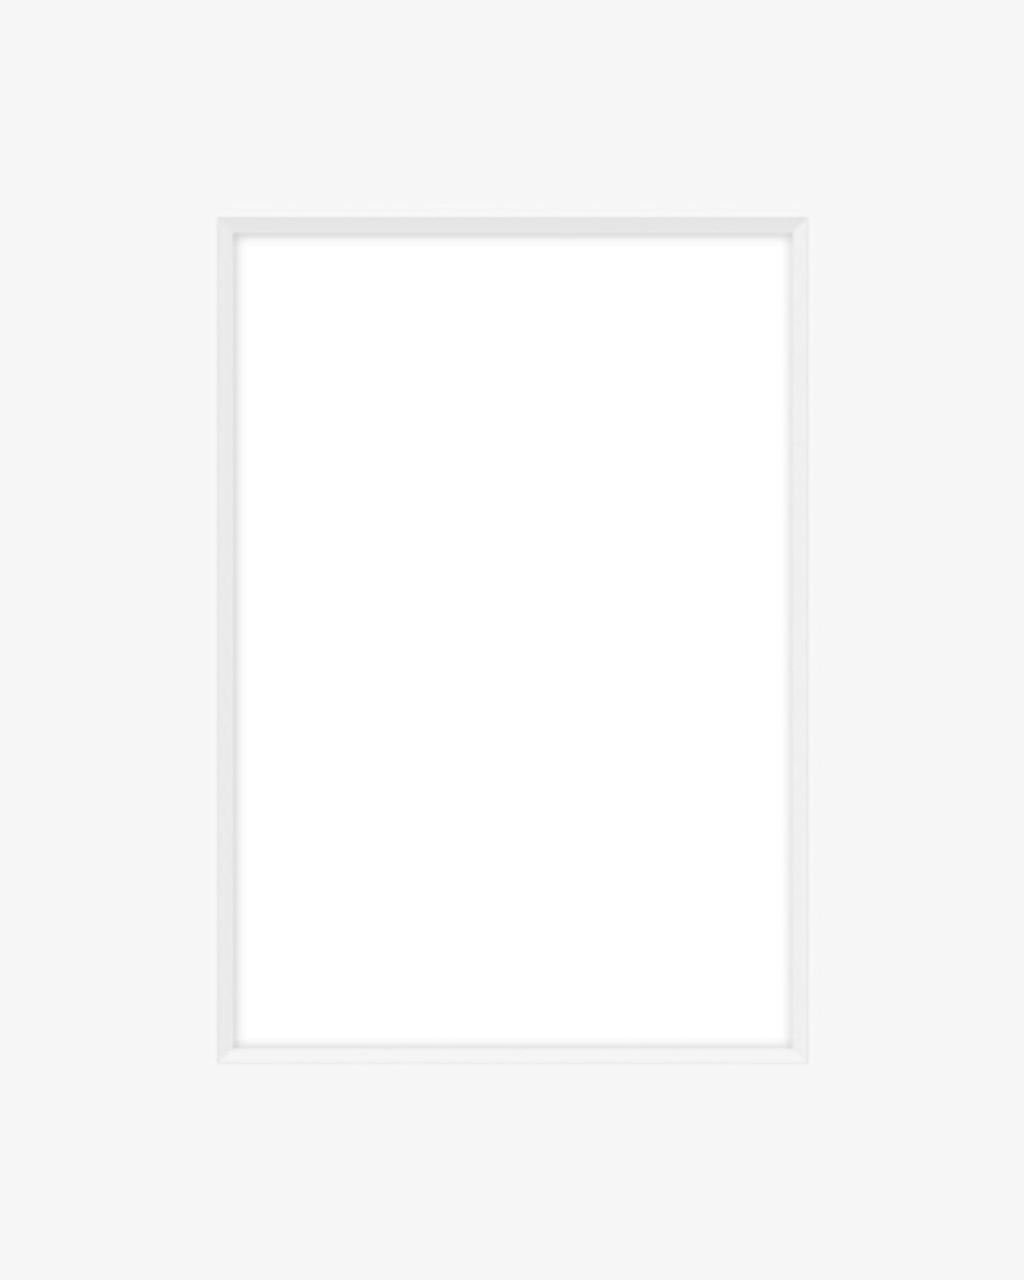 Standard Mats - Gallery Board